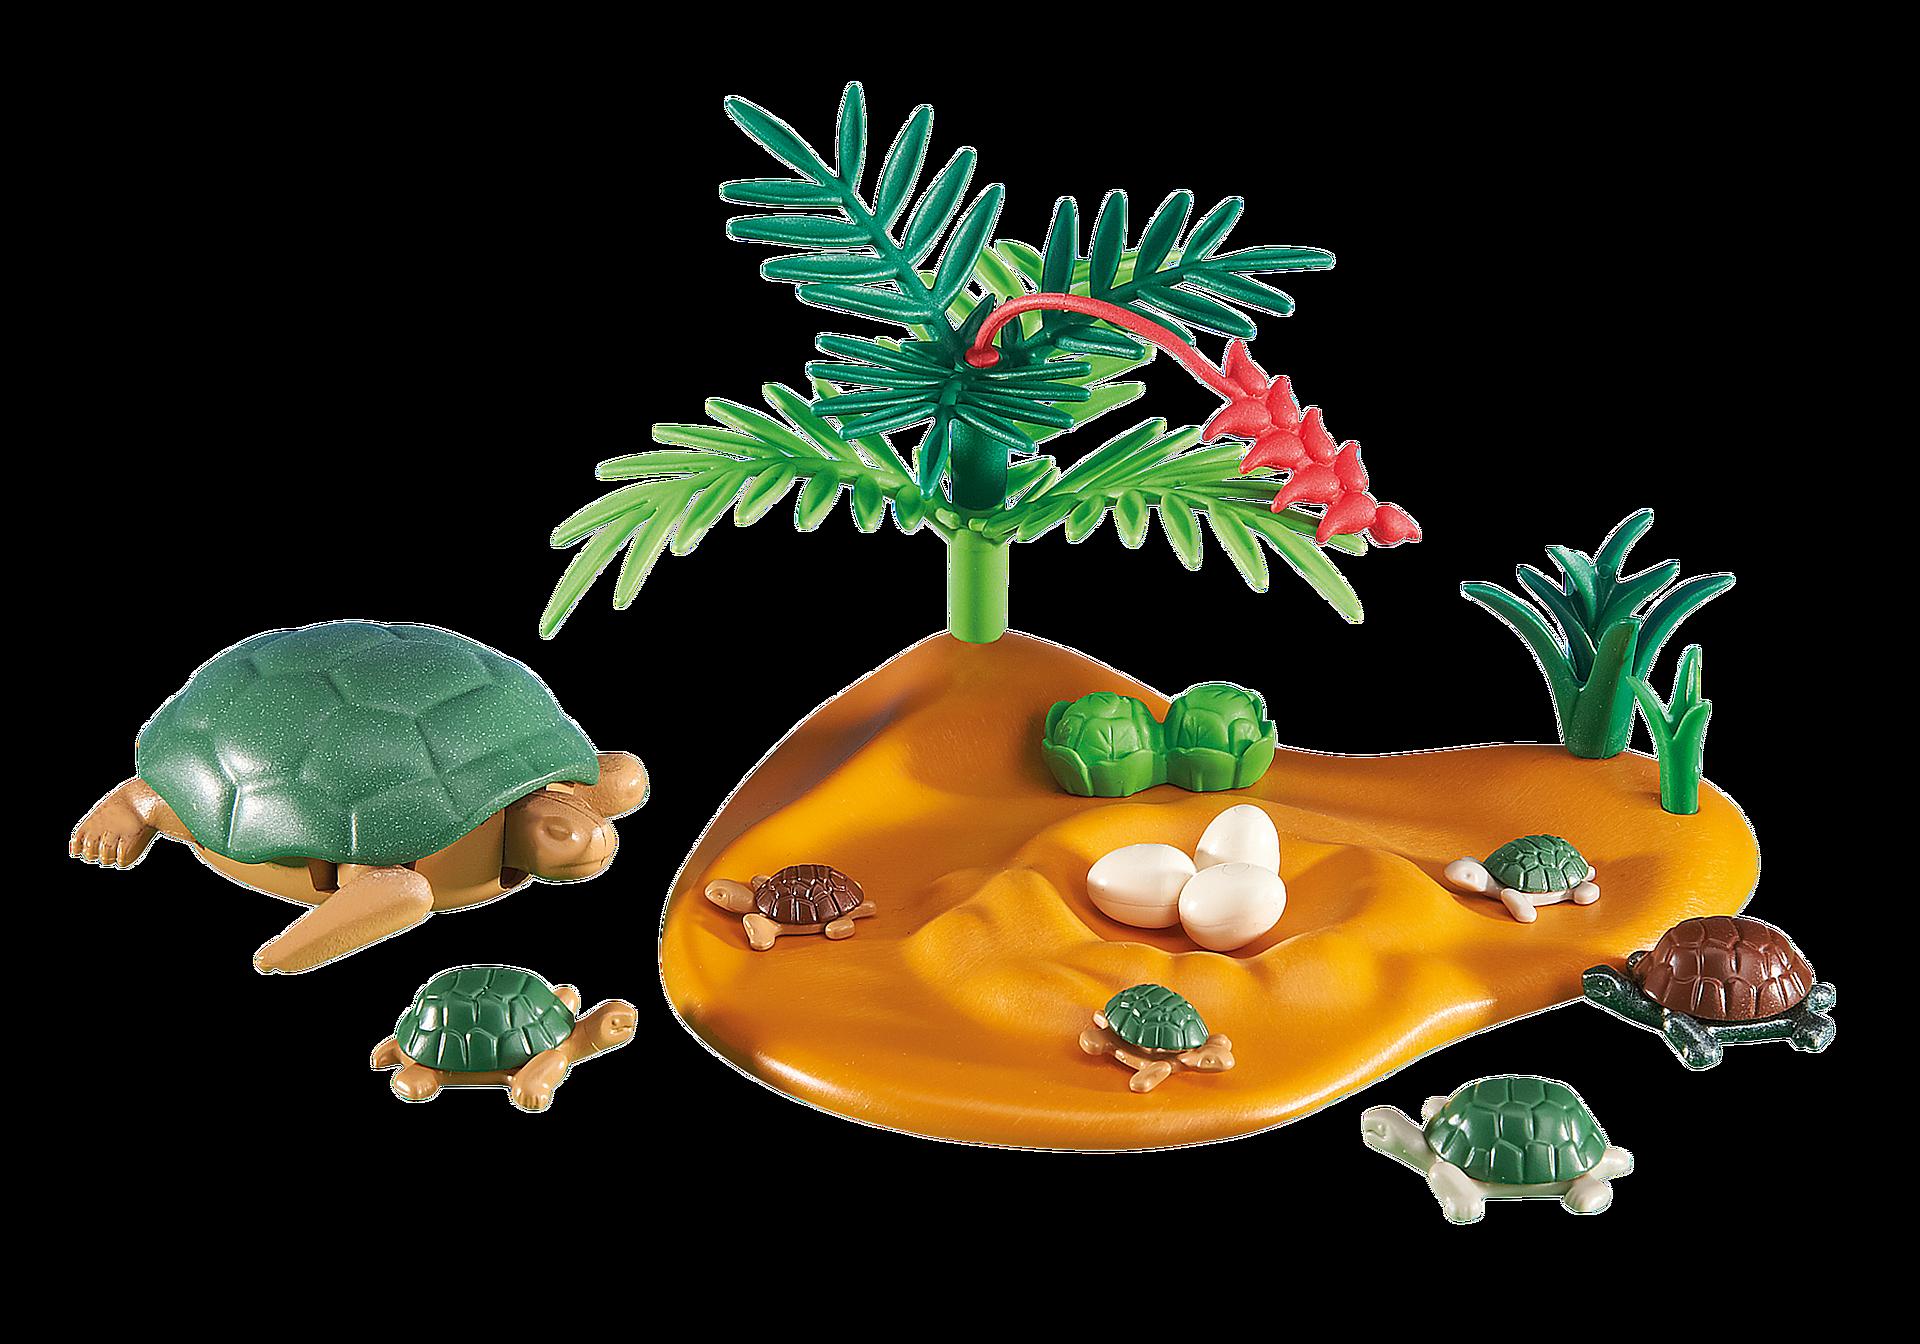 6420 Turtle with Babies zoom image1